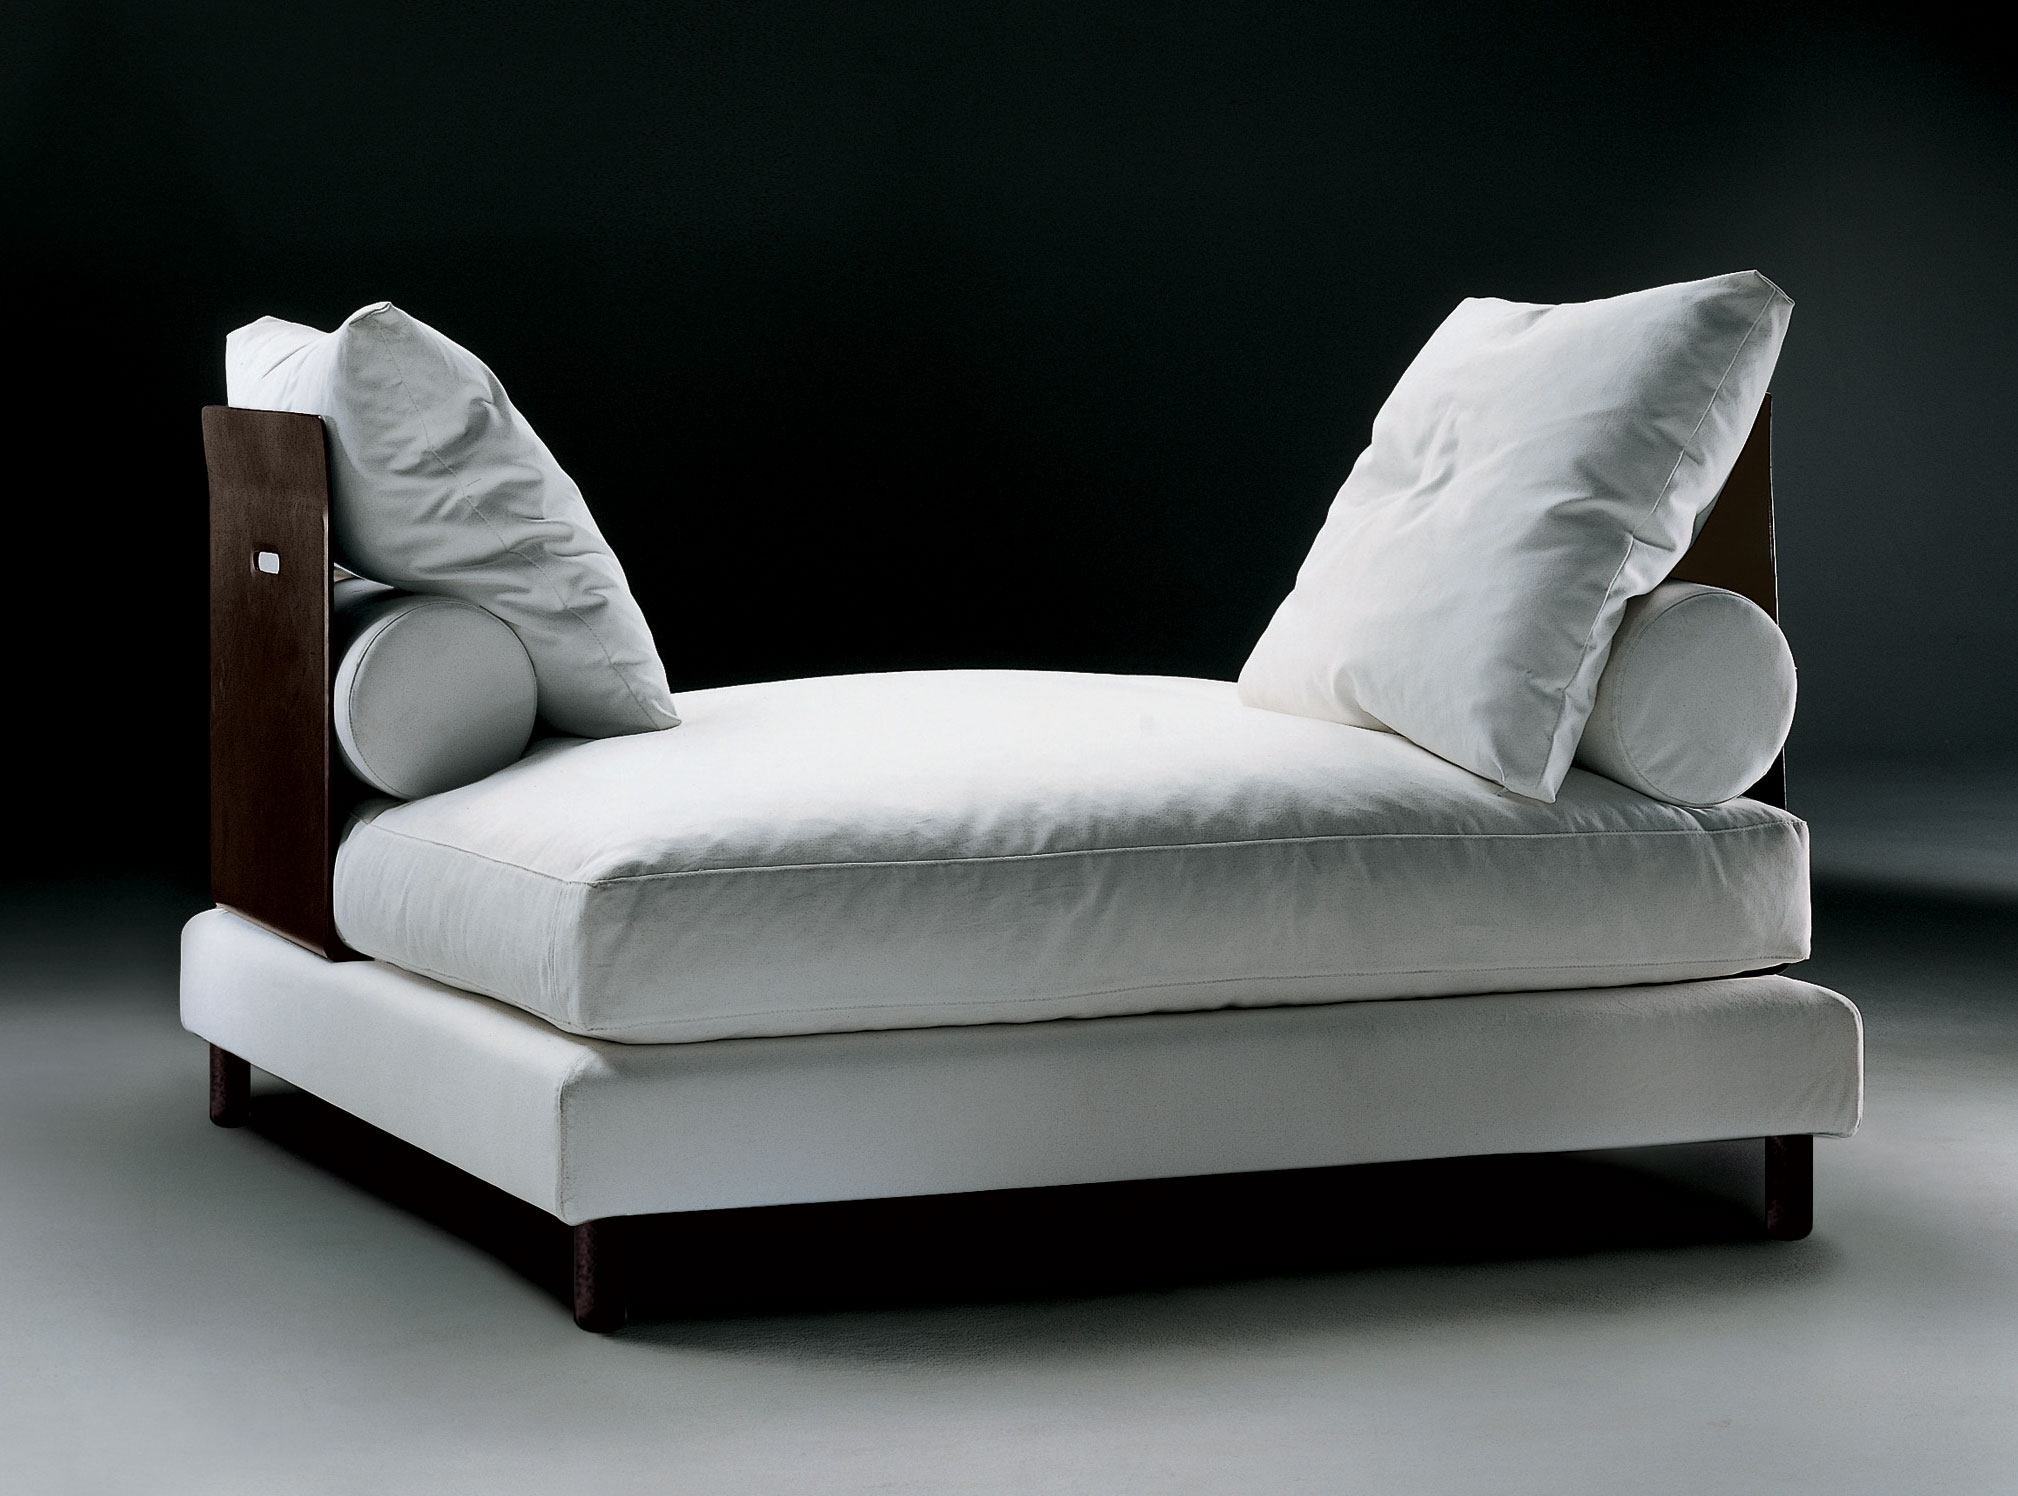 Flexform long island sofa - Divano long island flexform ...